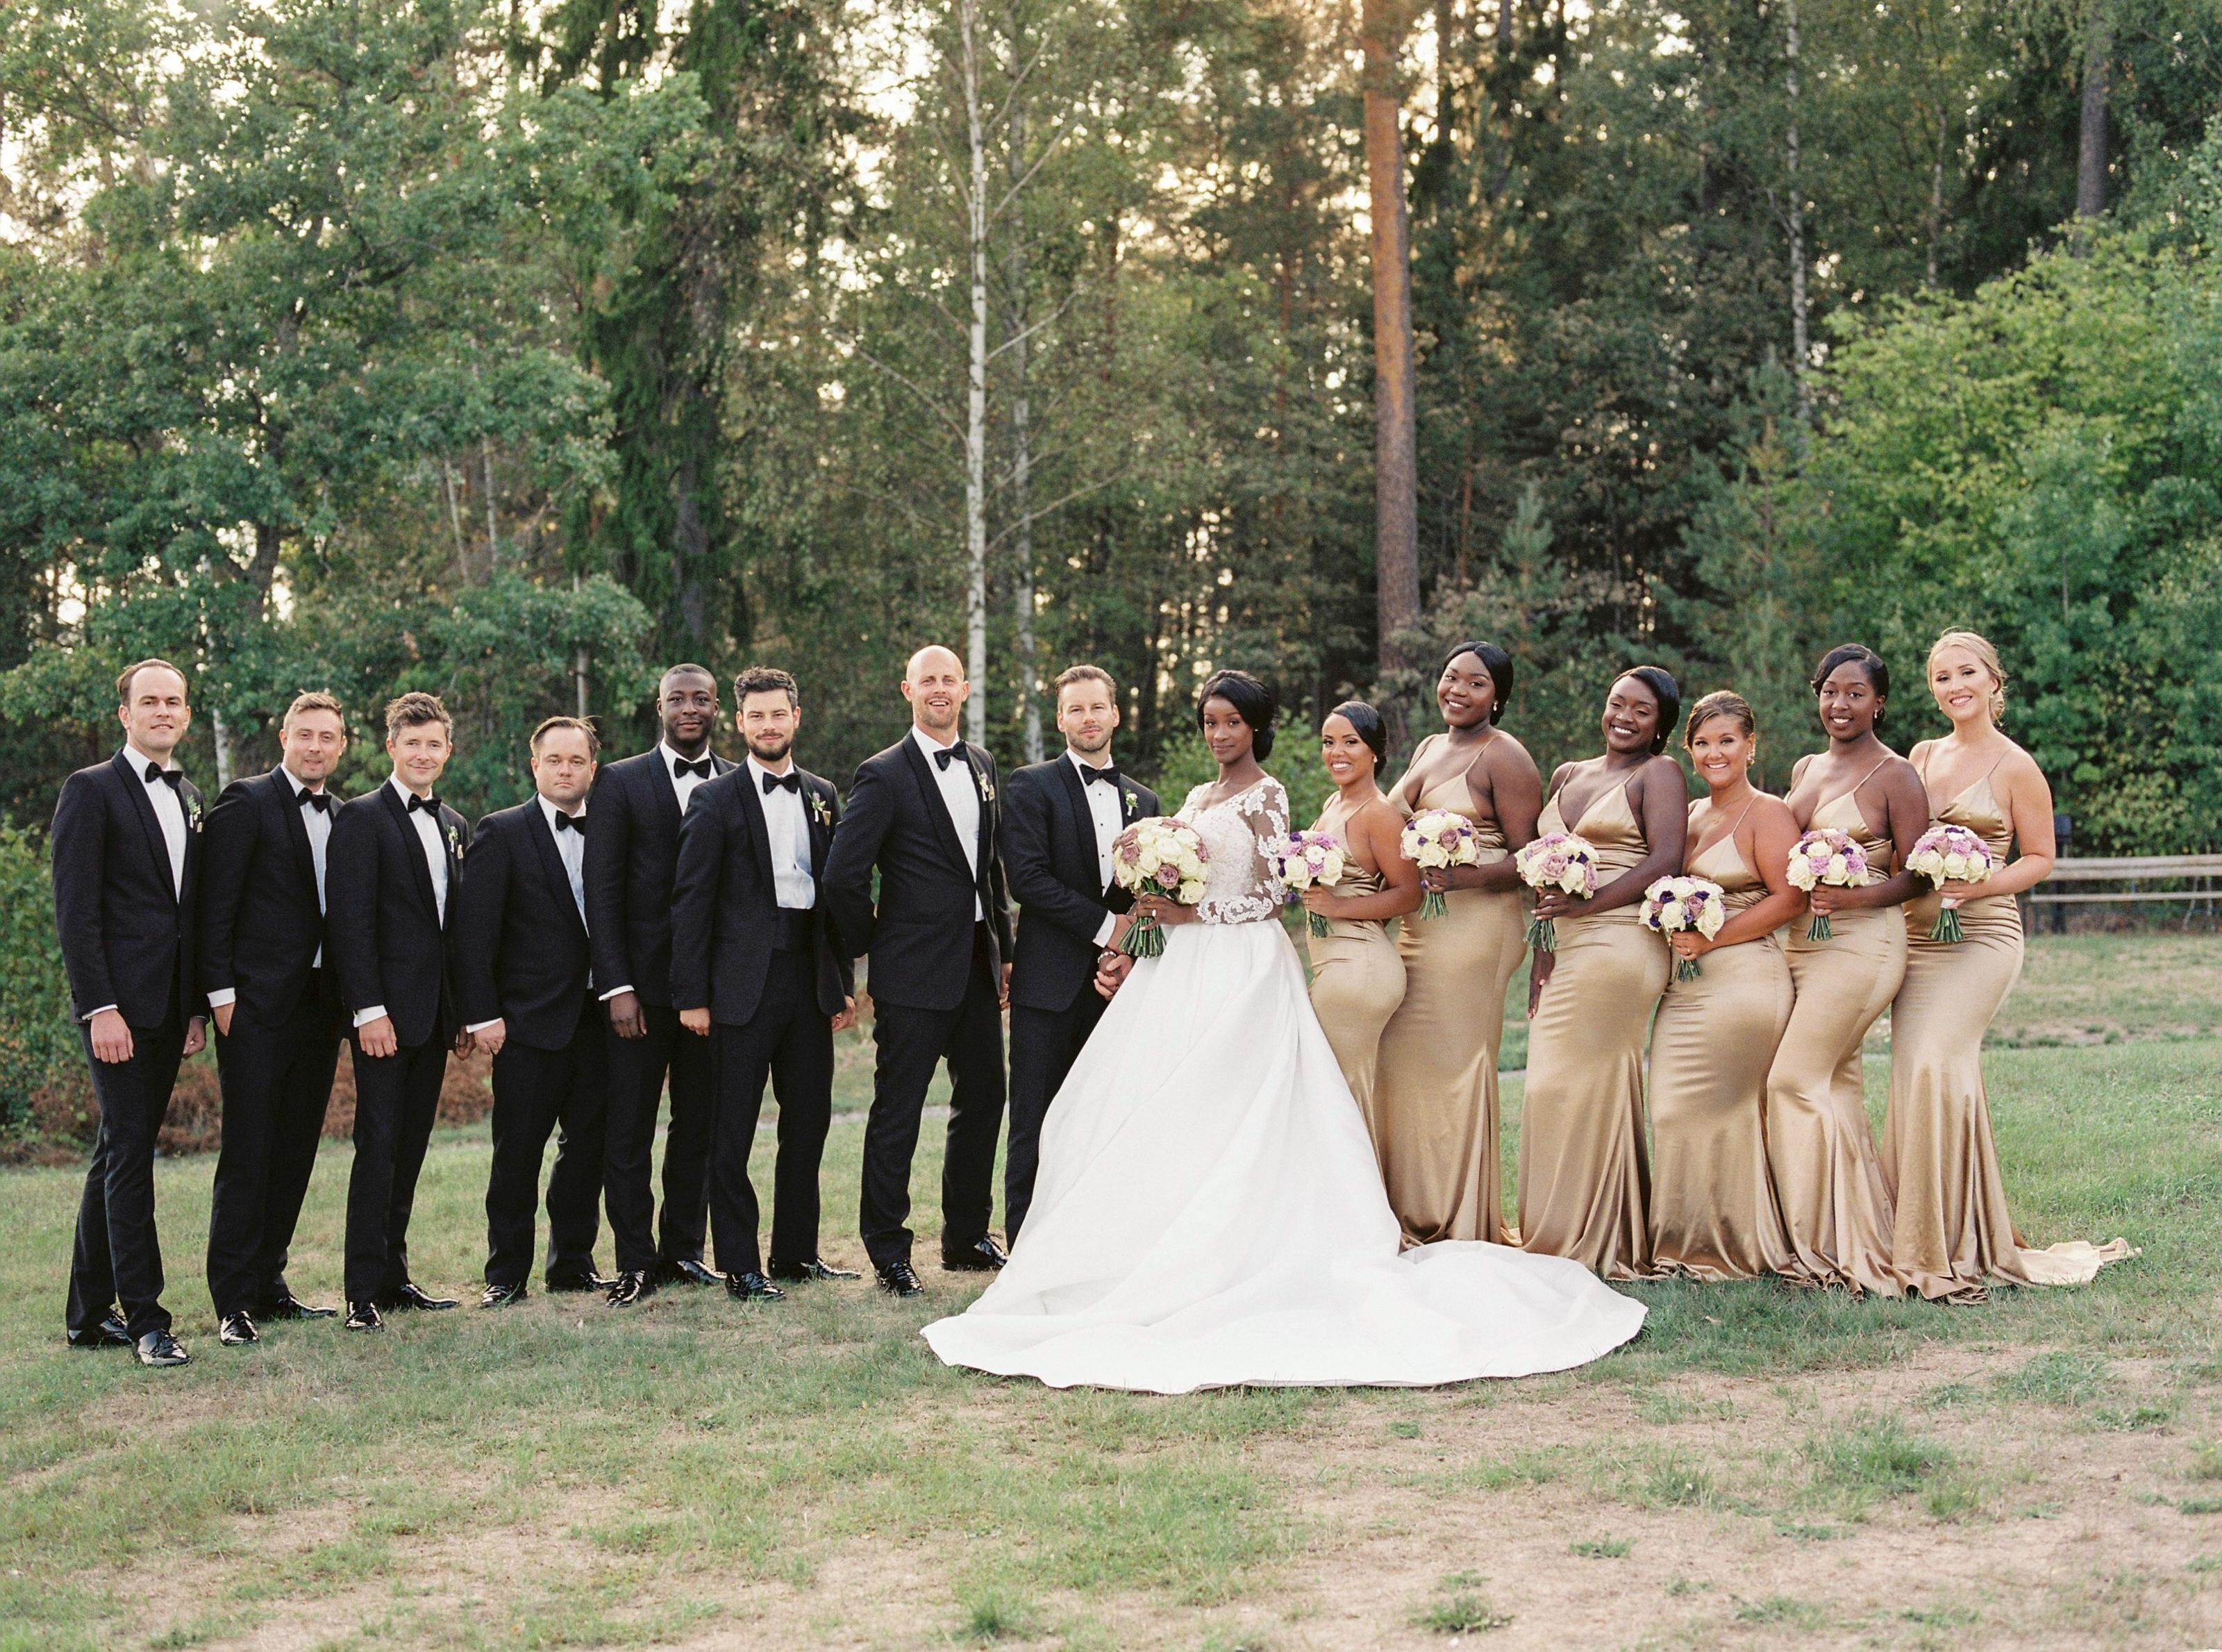 2BridesPhotography_Ågren_Wedding_0481